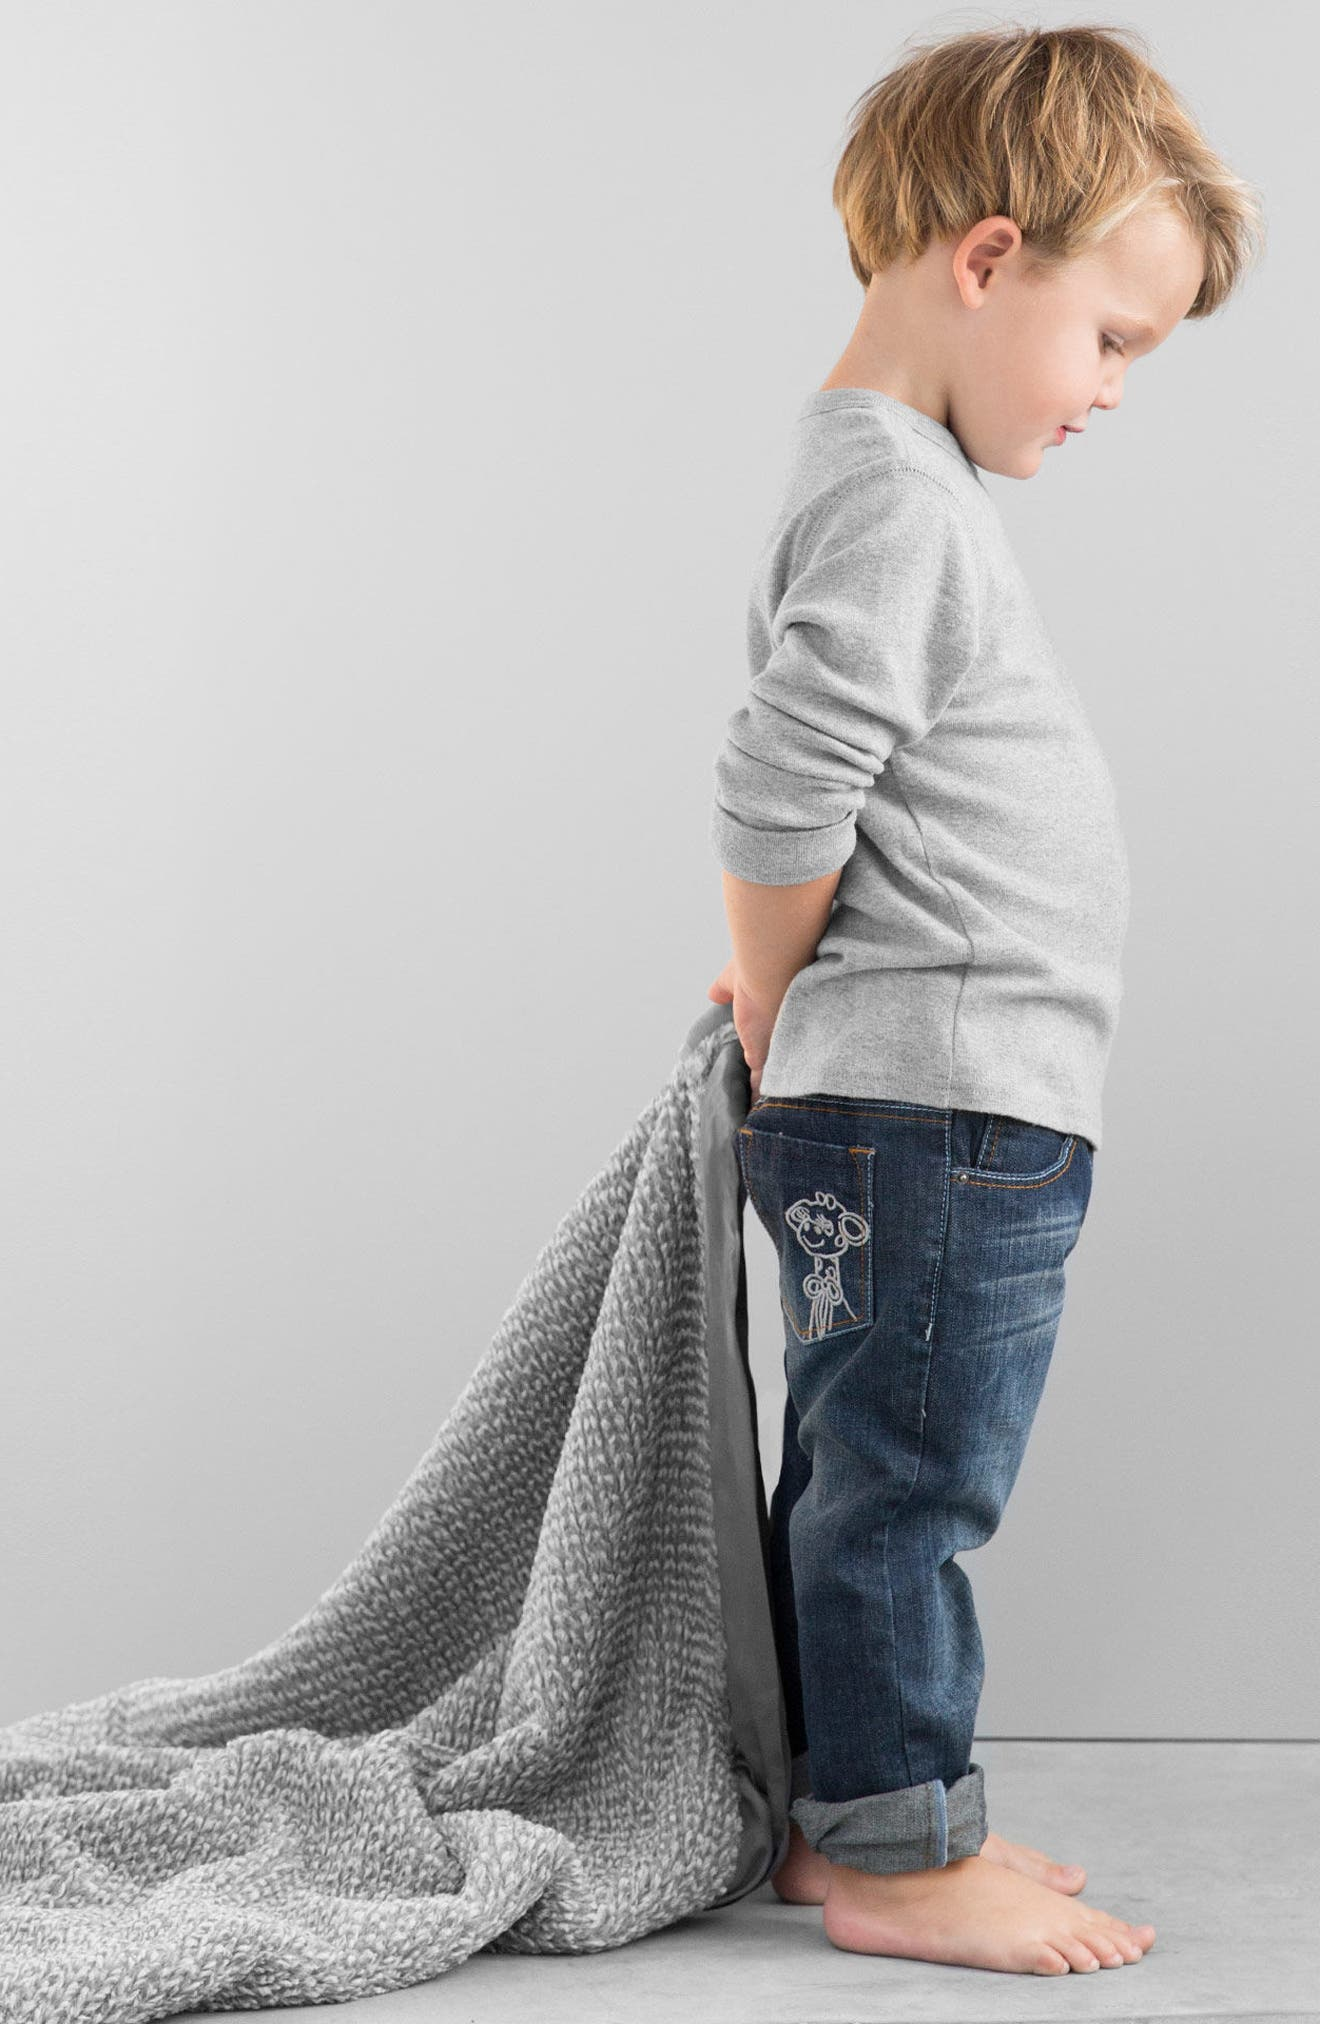 Luxe Herringbone Blanket,                             Alternate thumbnail 2, color,                             CHARCOAL